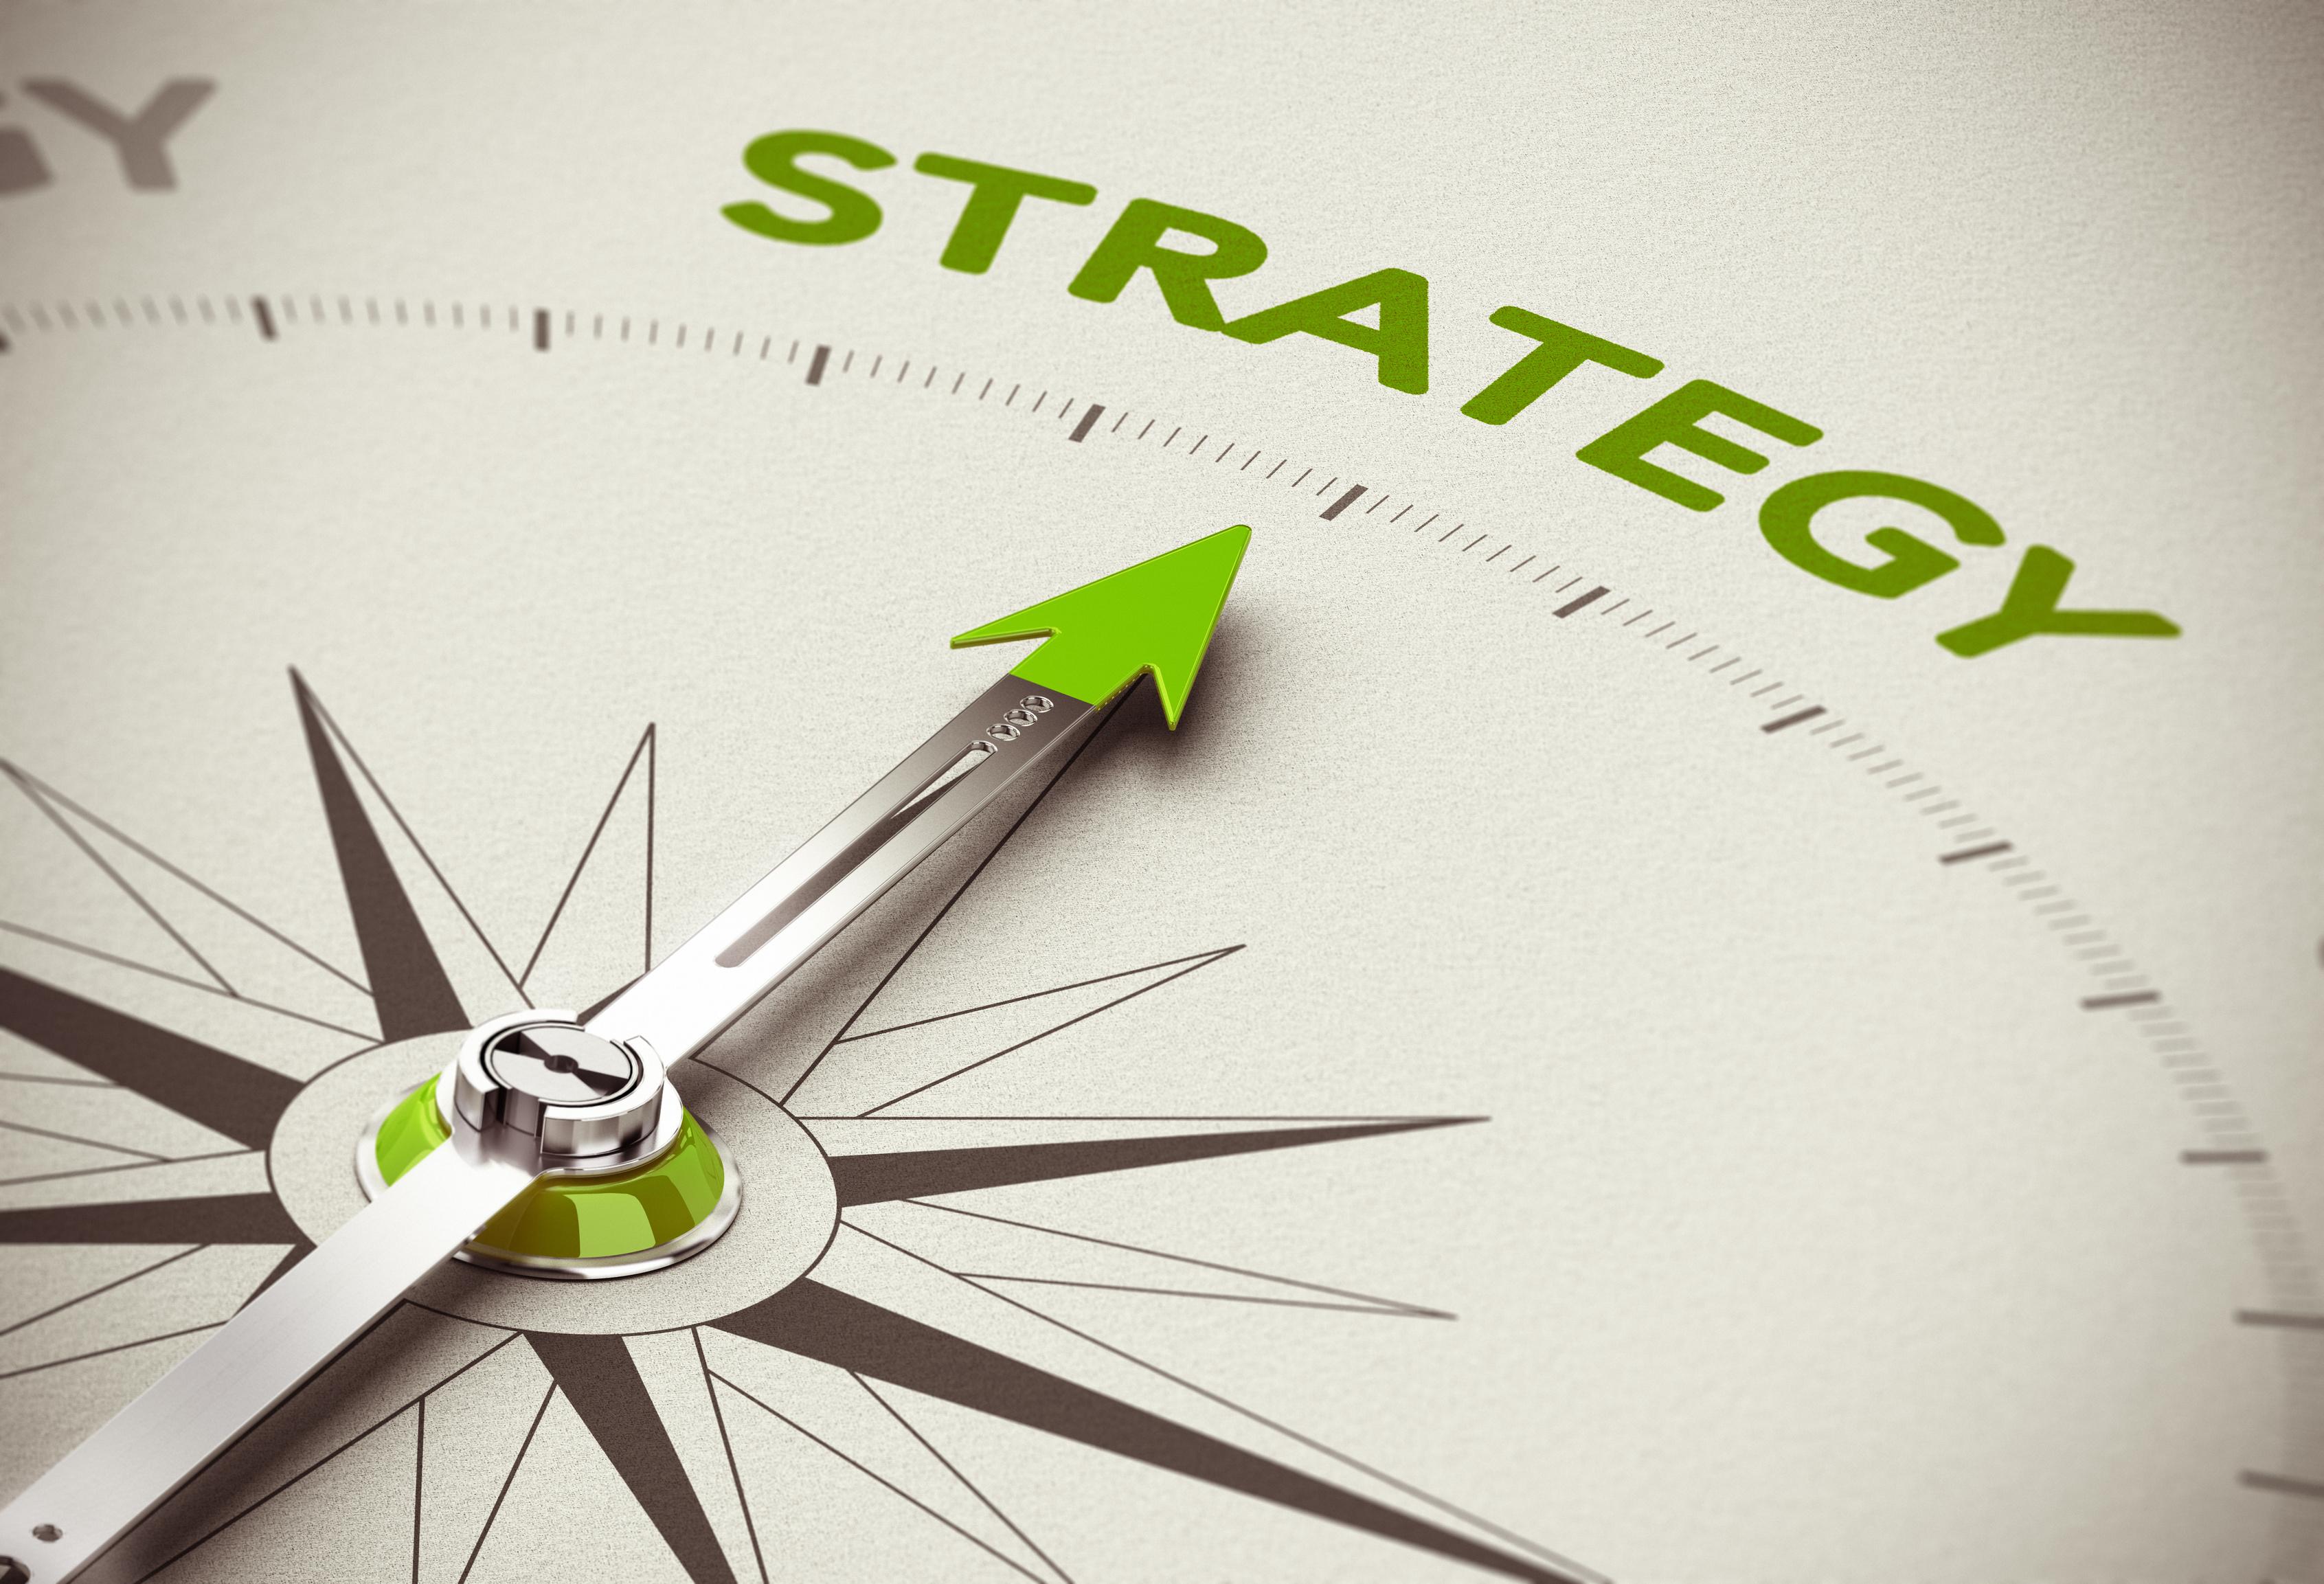 Customer Service, Marketing & IT